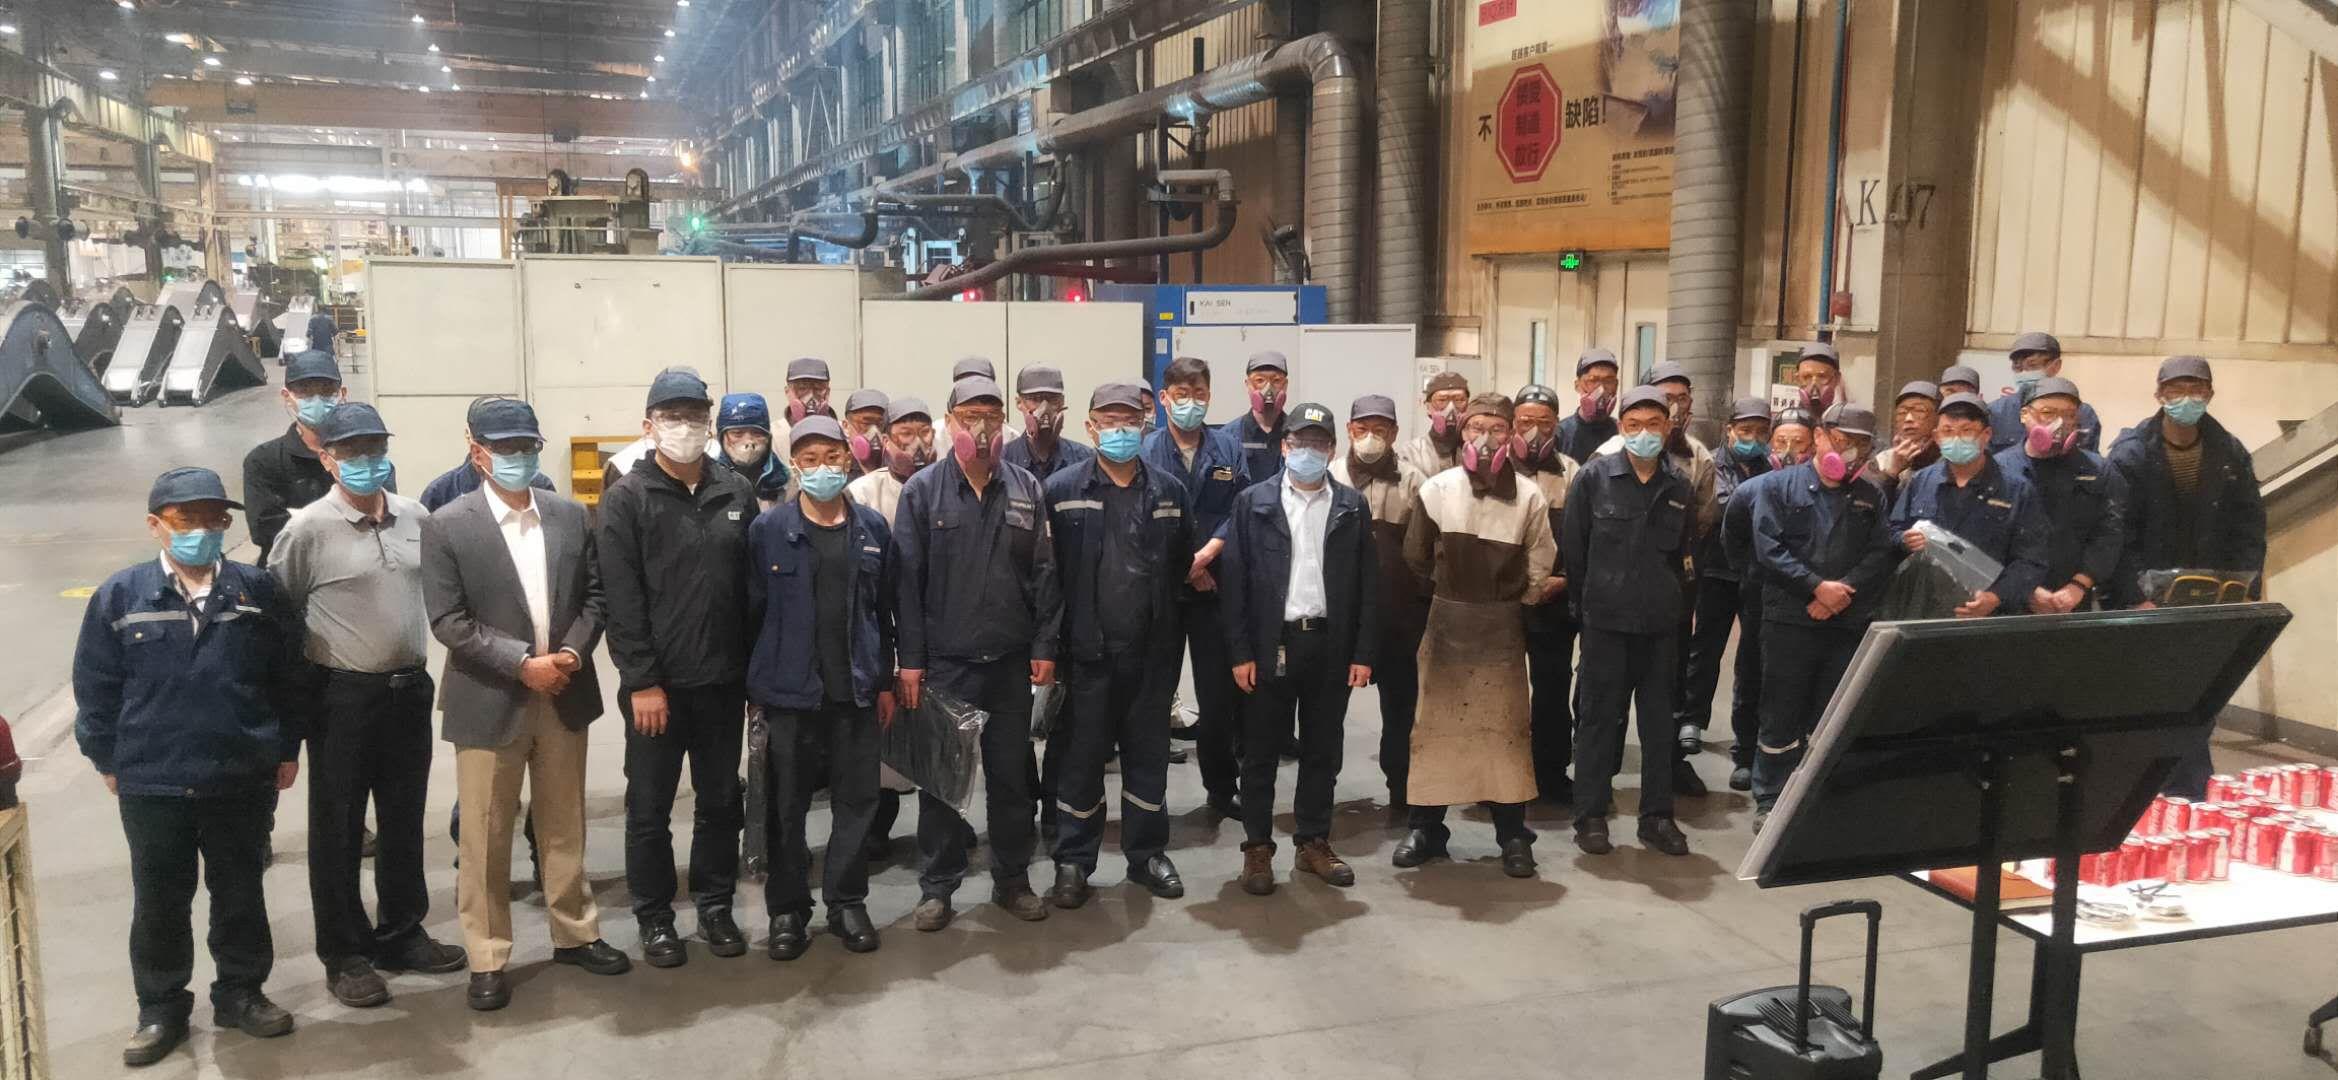 Caterpillar China's Welding Skills Competition